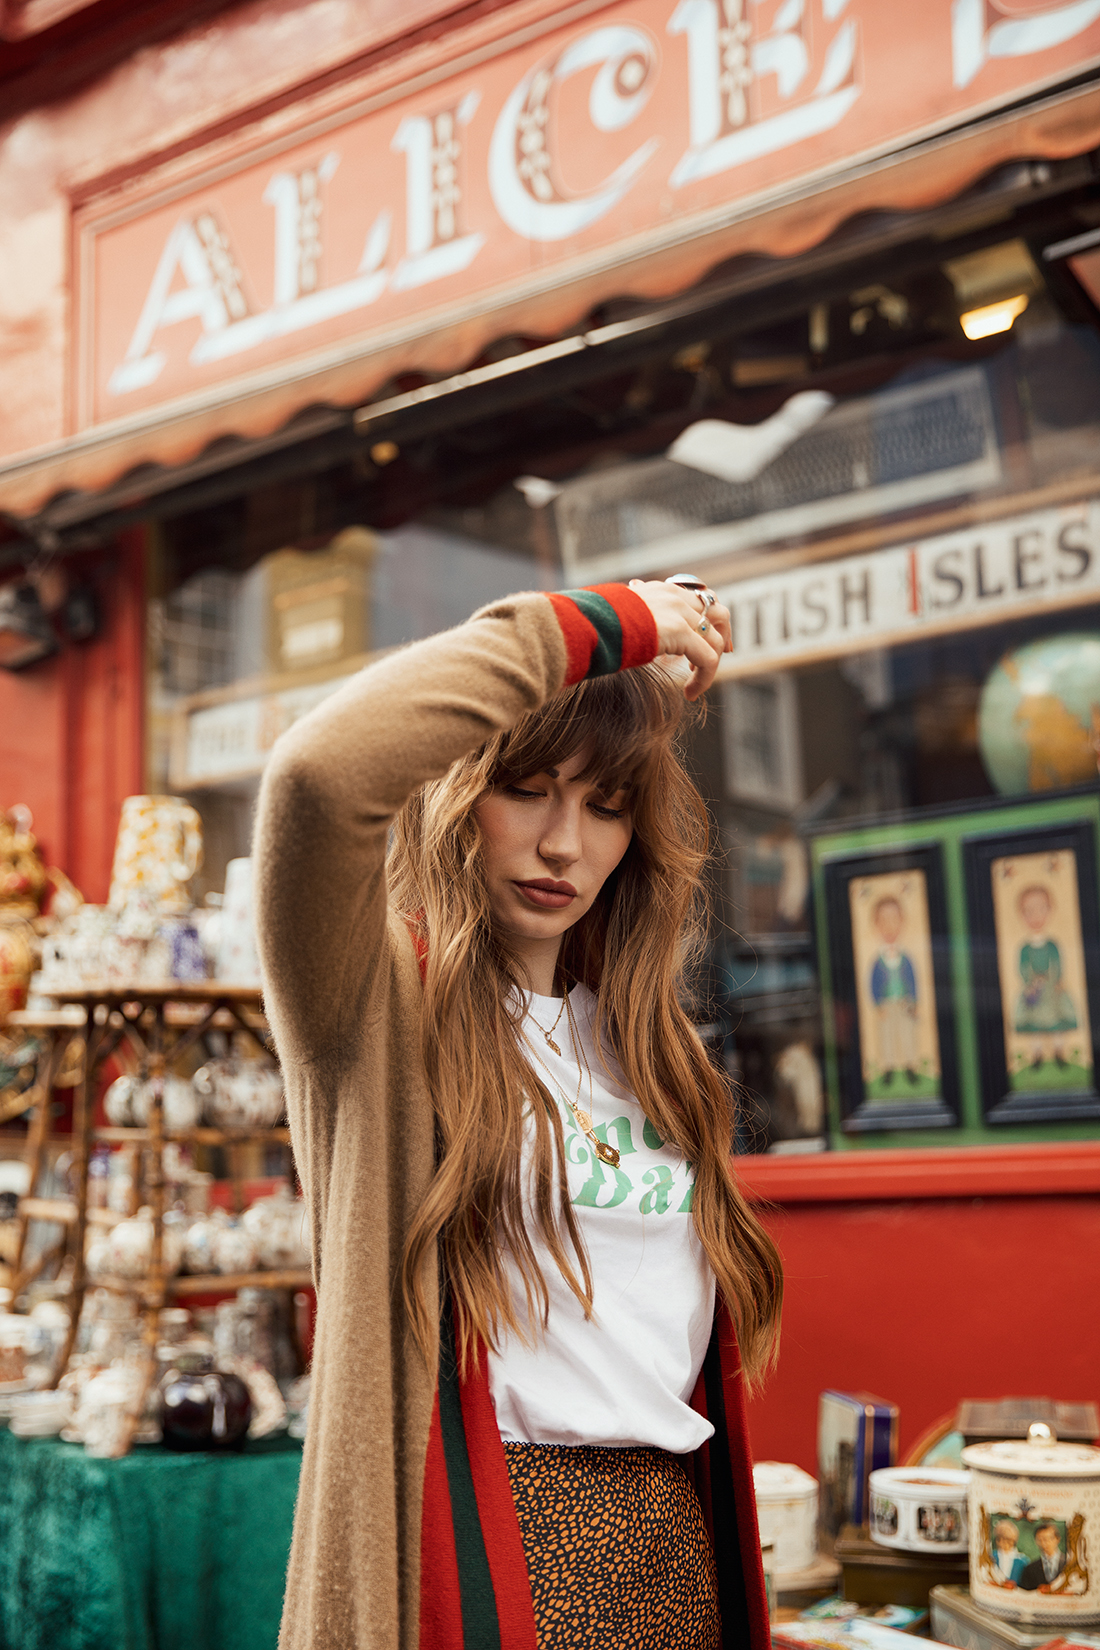 Blogger fashion photoshoot with Sara Louise Thomas from Waiste Vintage by photographer Ailera Stone